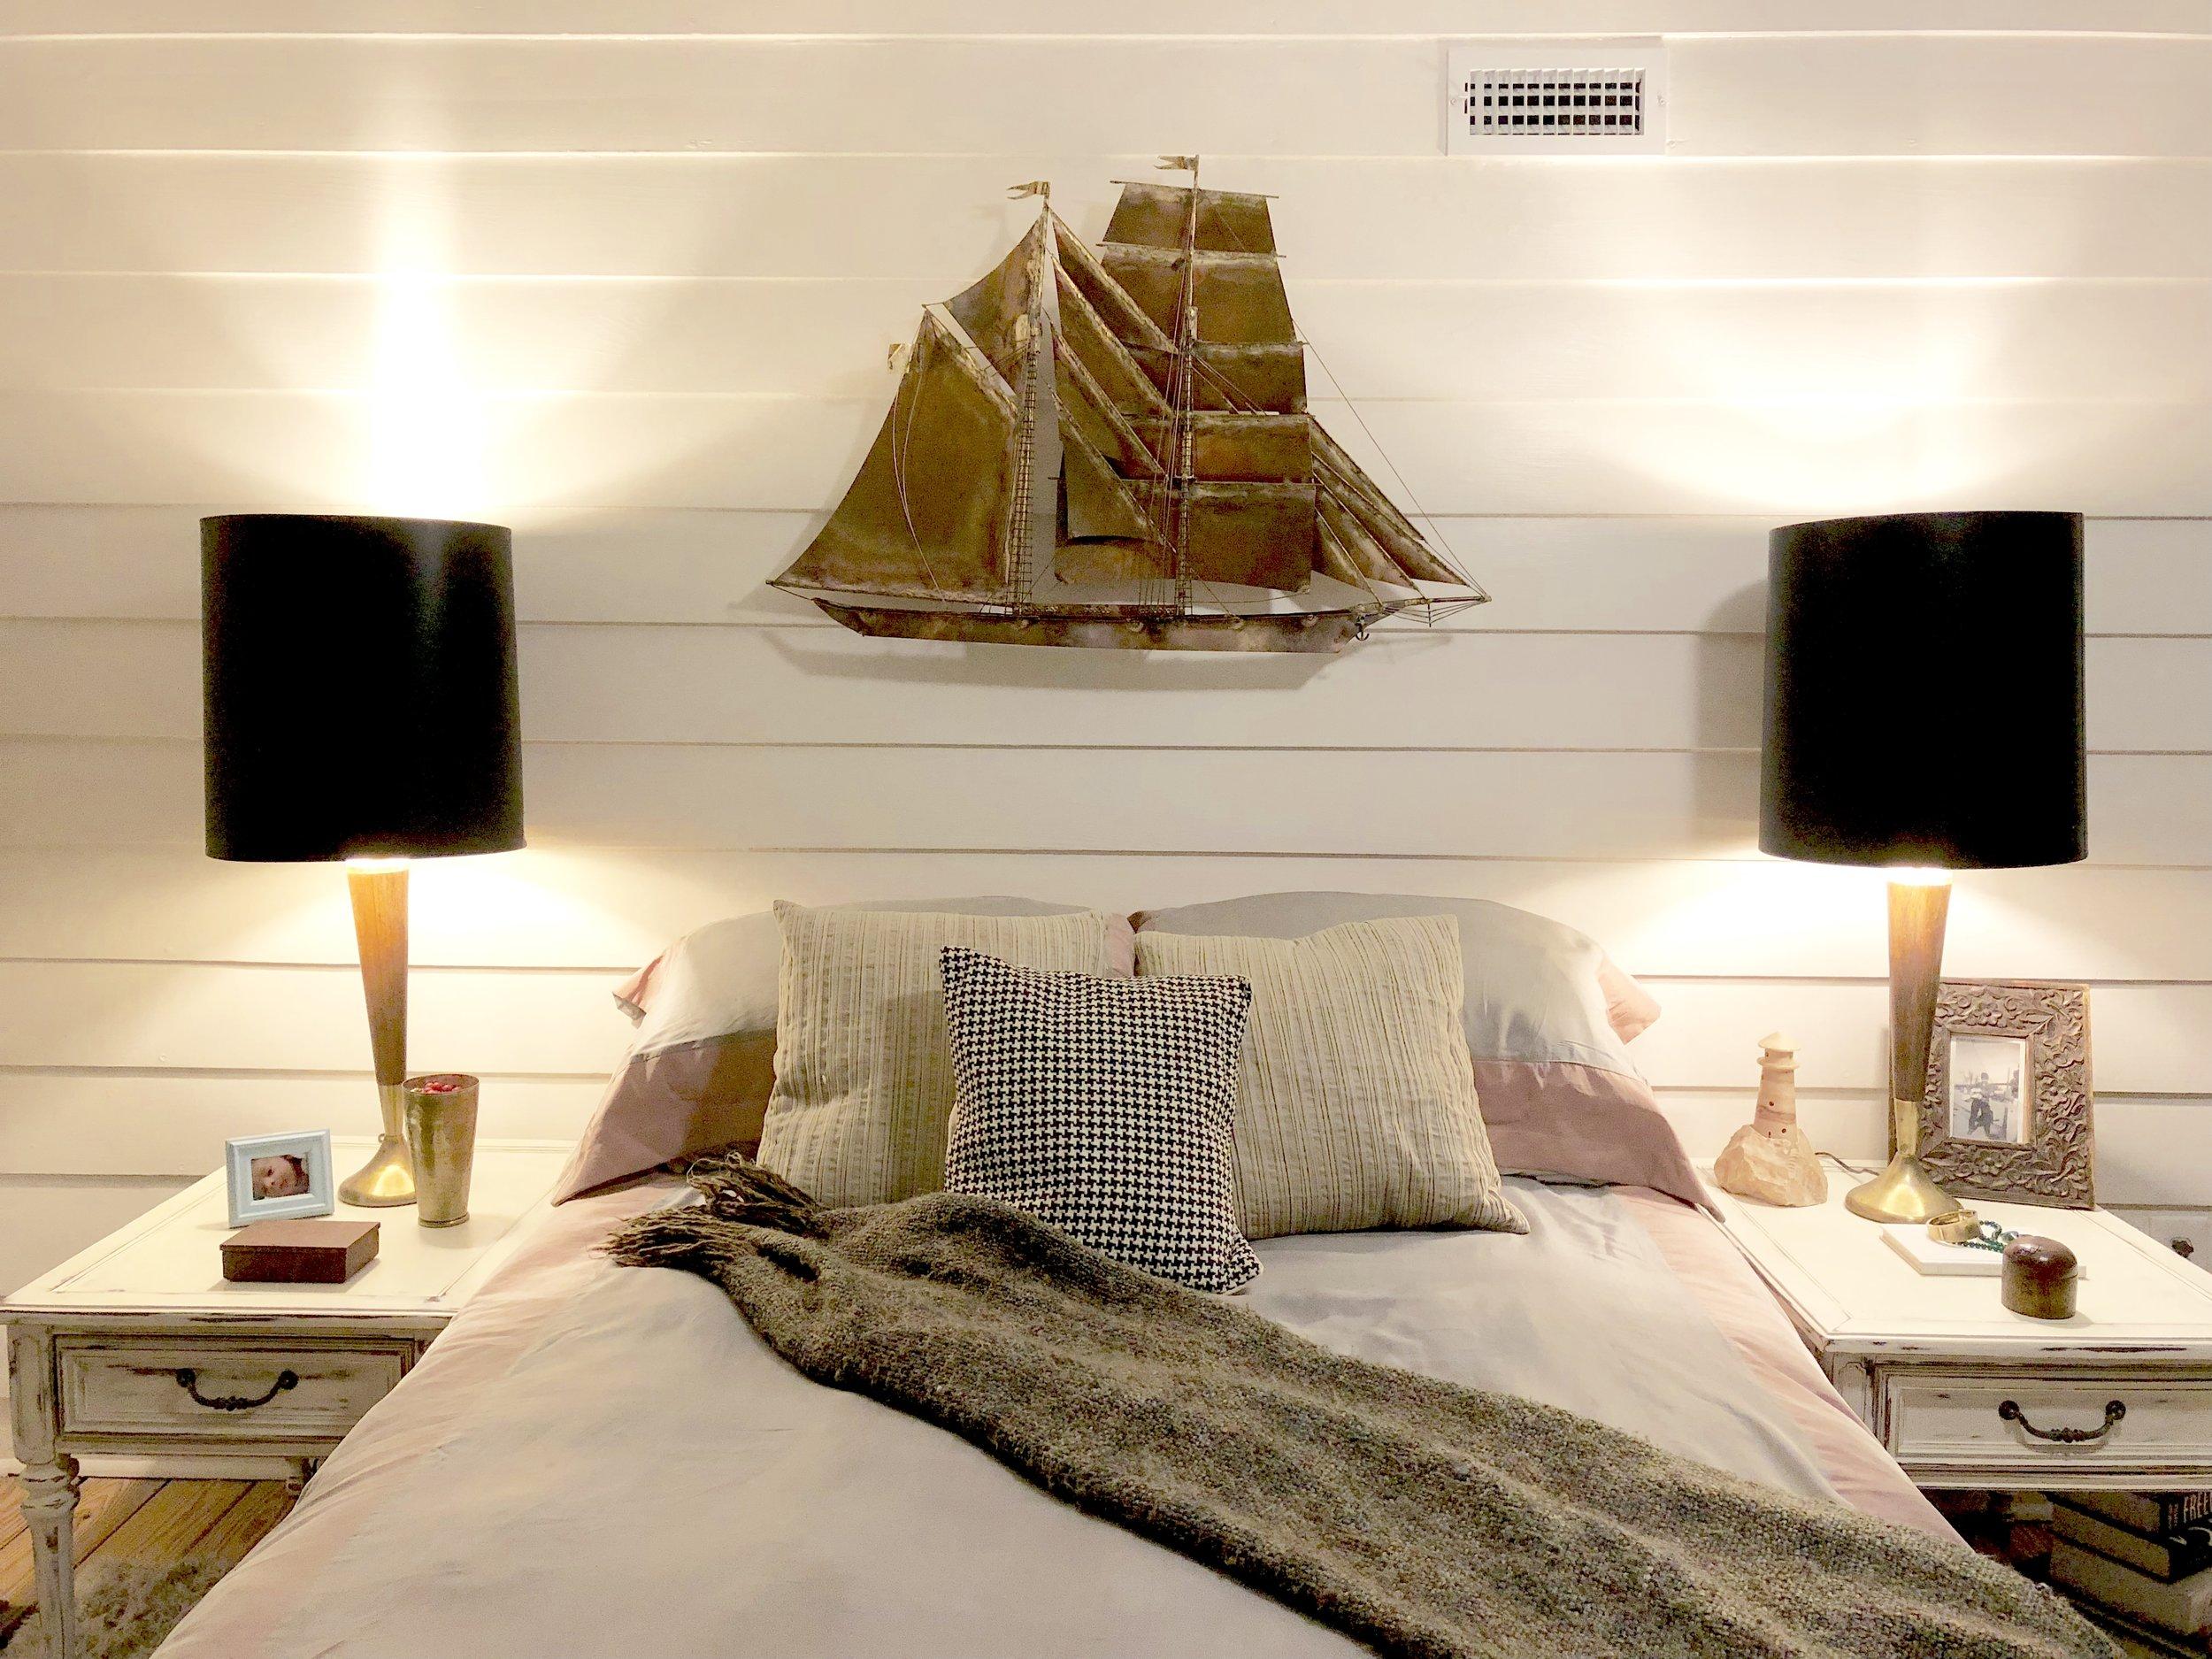 jere-wall-nautical.jpg